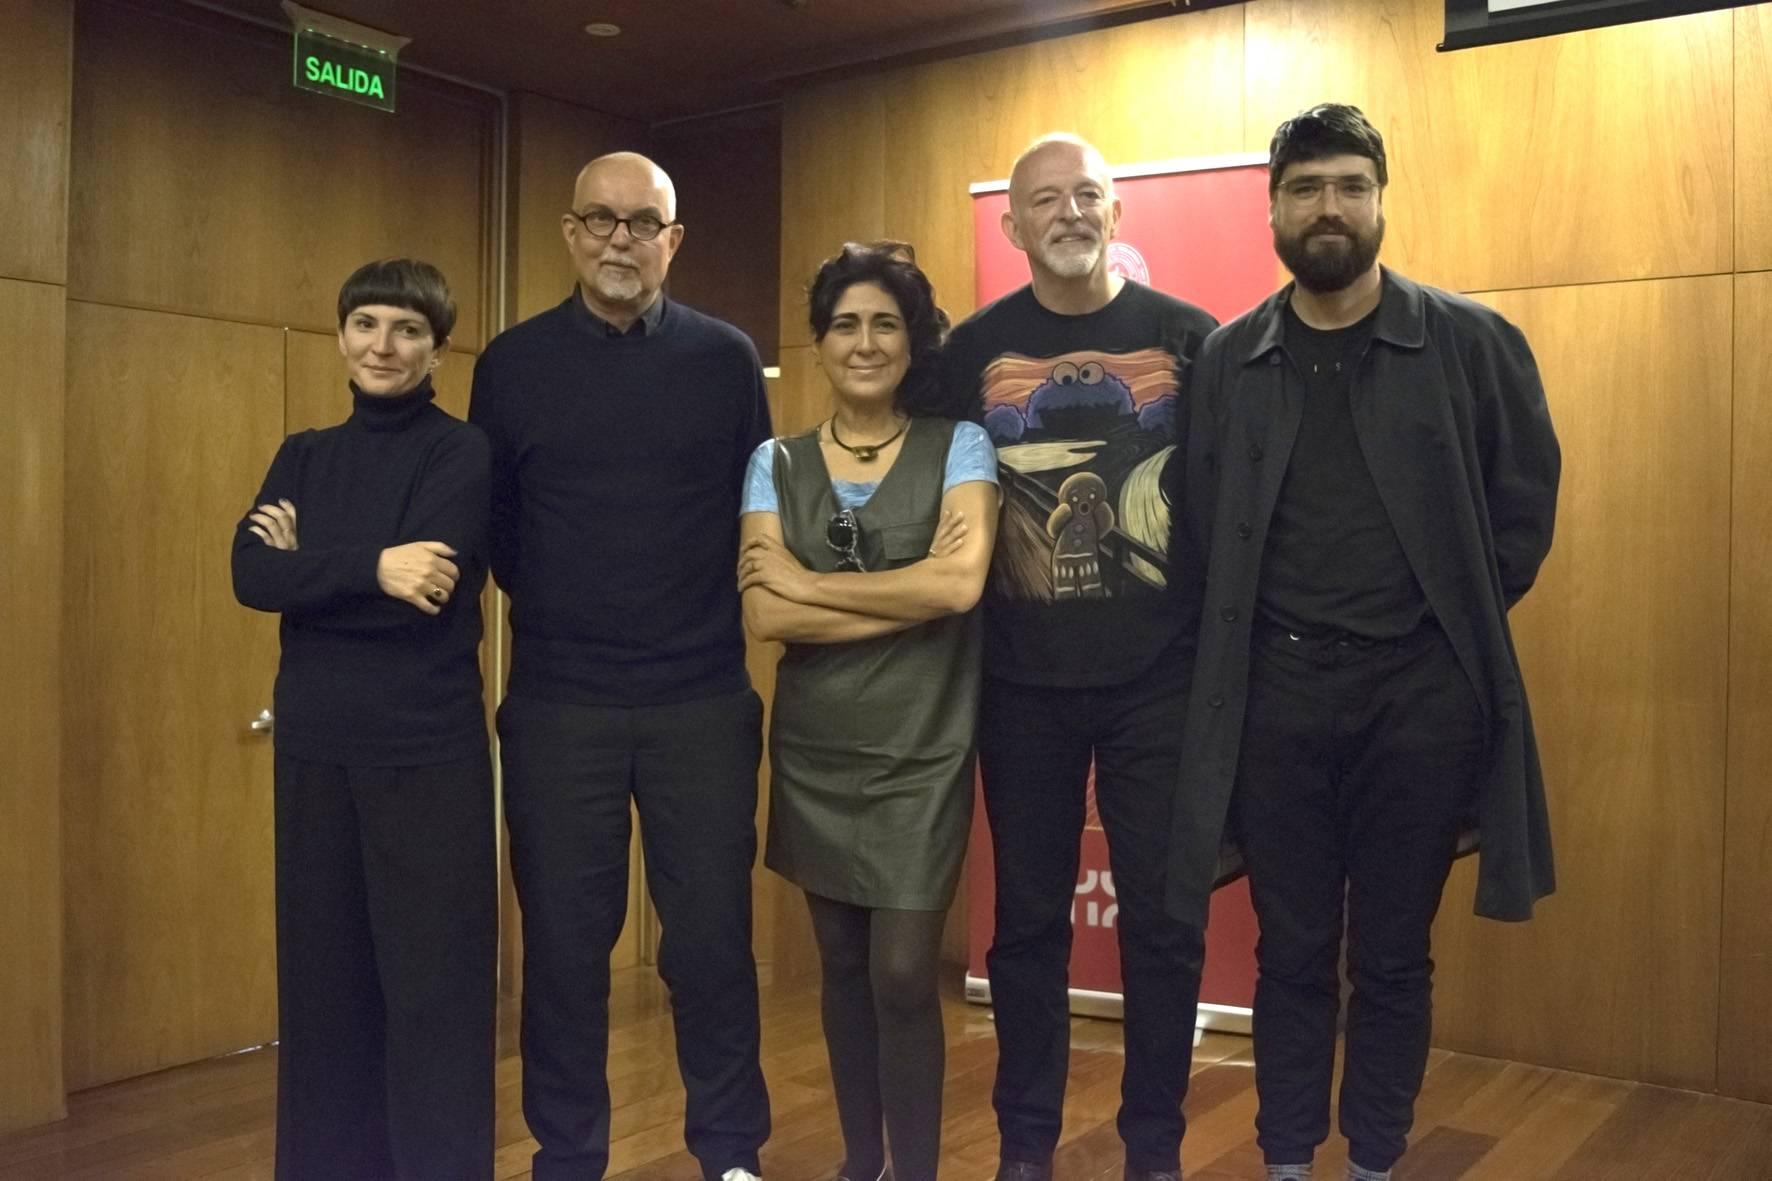 Vera Kunz, Markus Weisbeck, Cecilia Mariaca Cardozo, Diego Vainesman, Adrian Palko